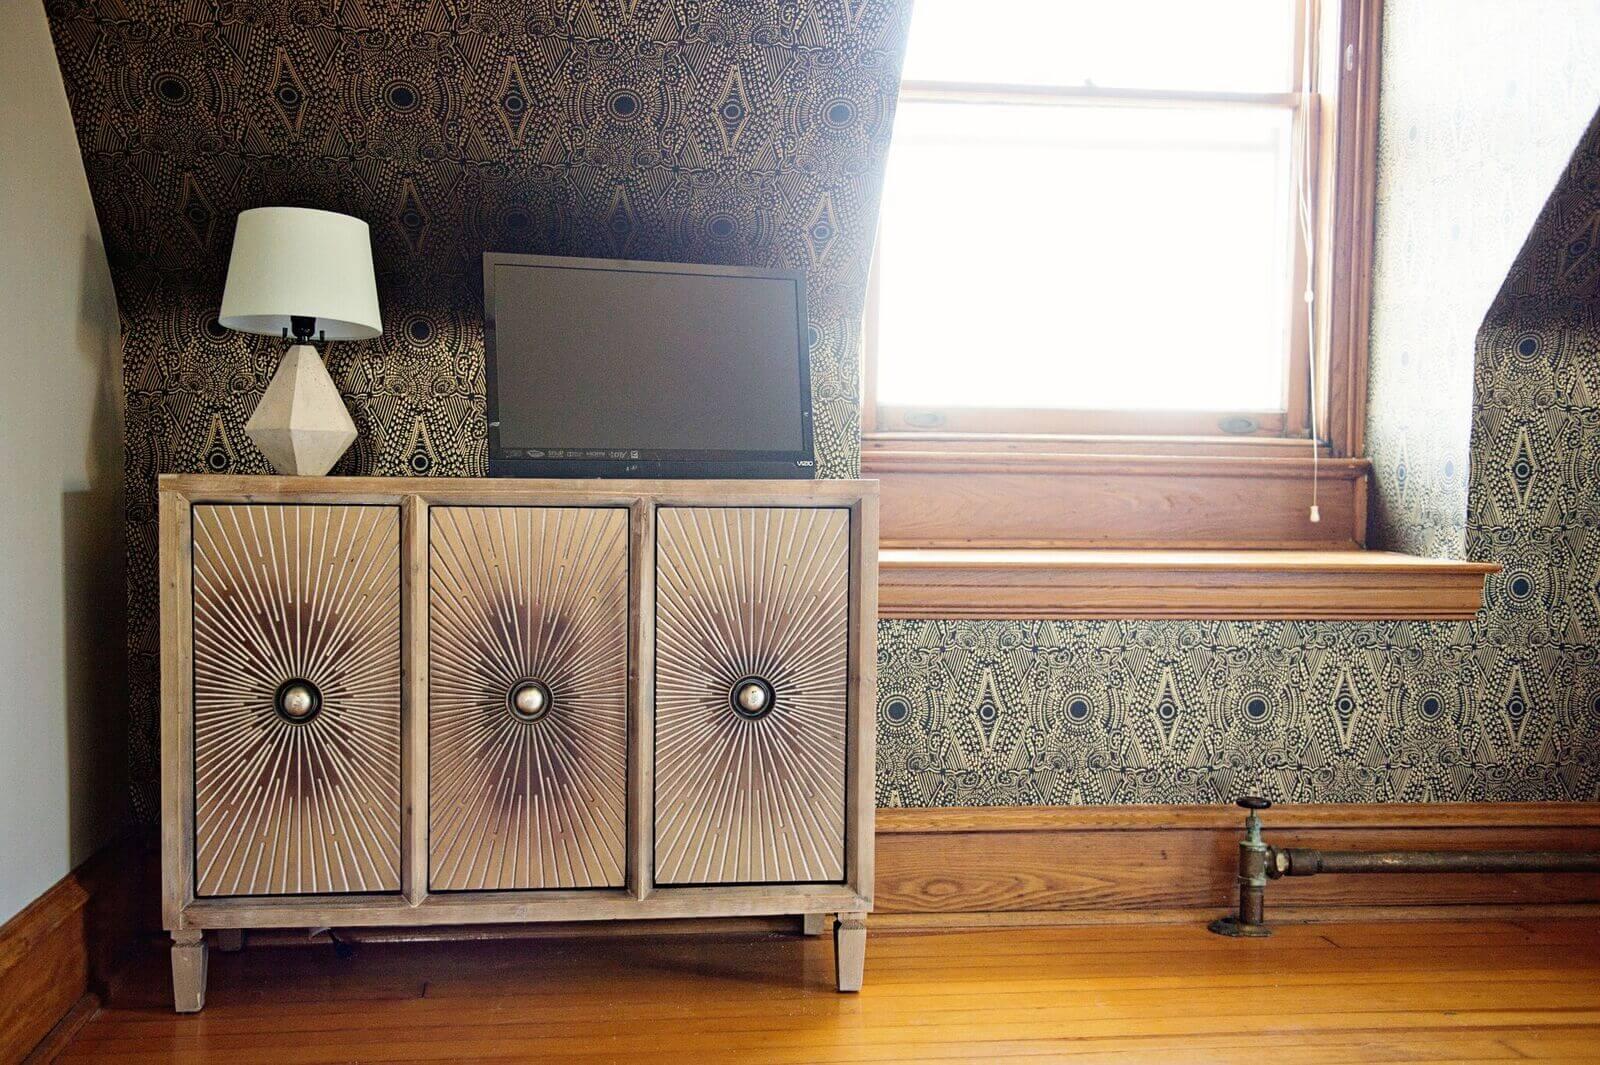 interior-design-bedroom-decor-kids-guest-room-elegant-philadelphia-pa-3.jpeg